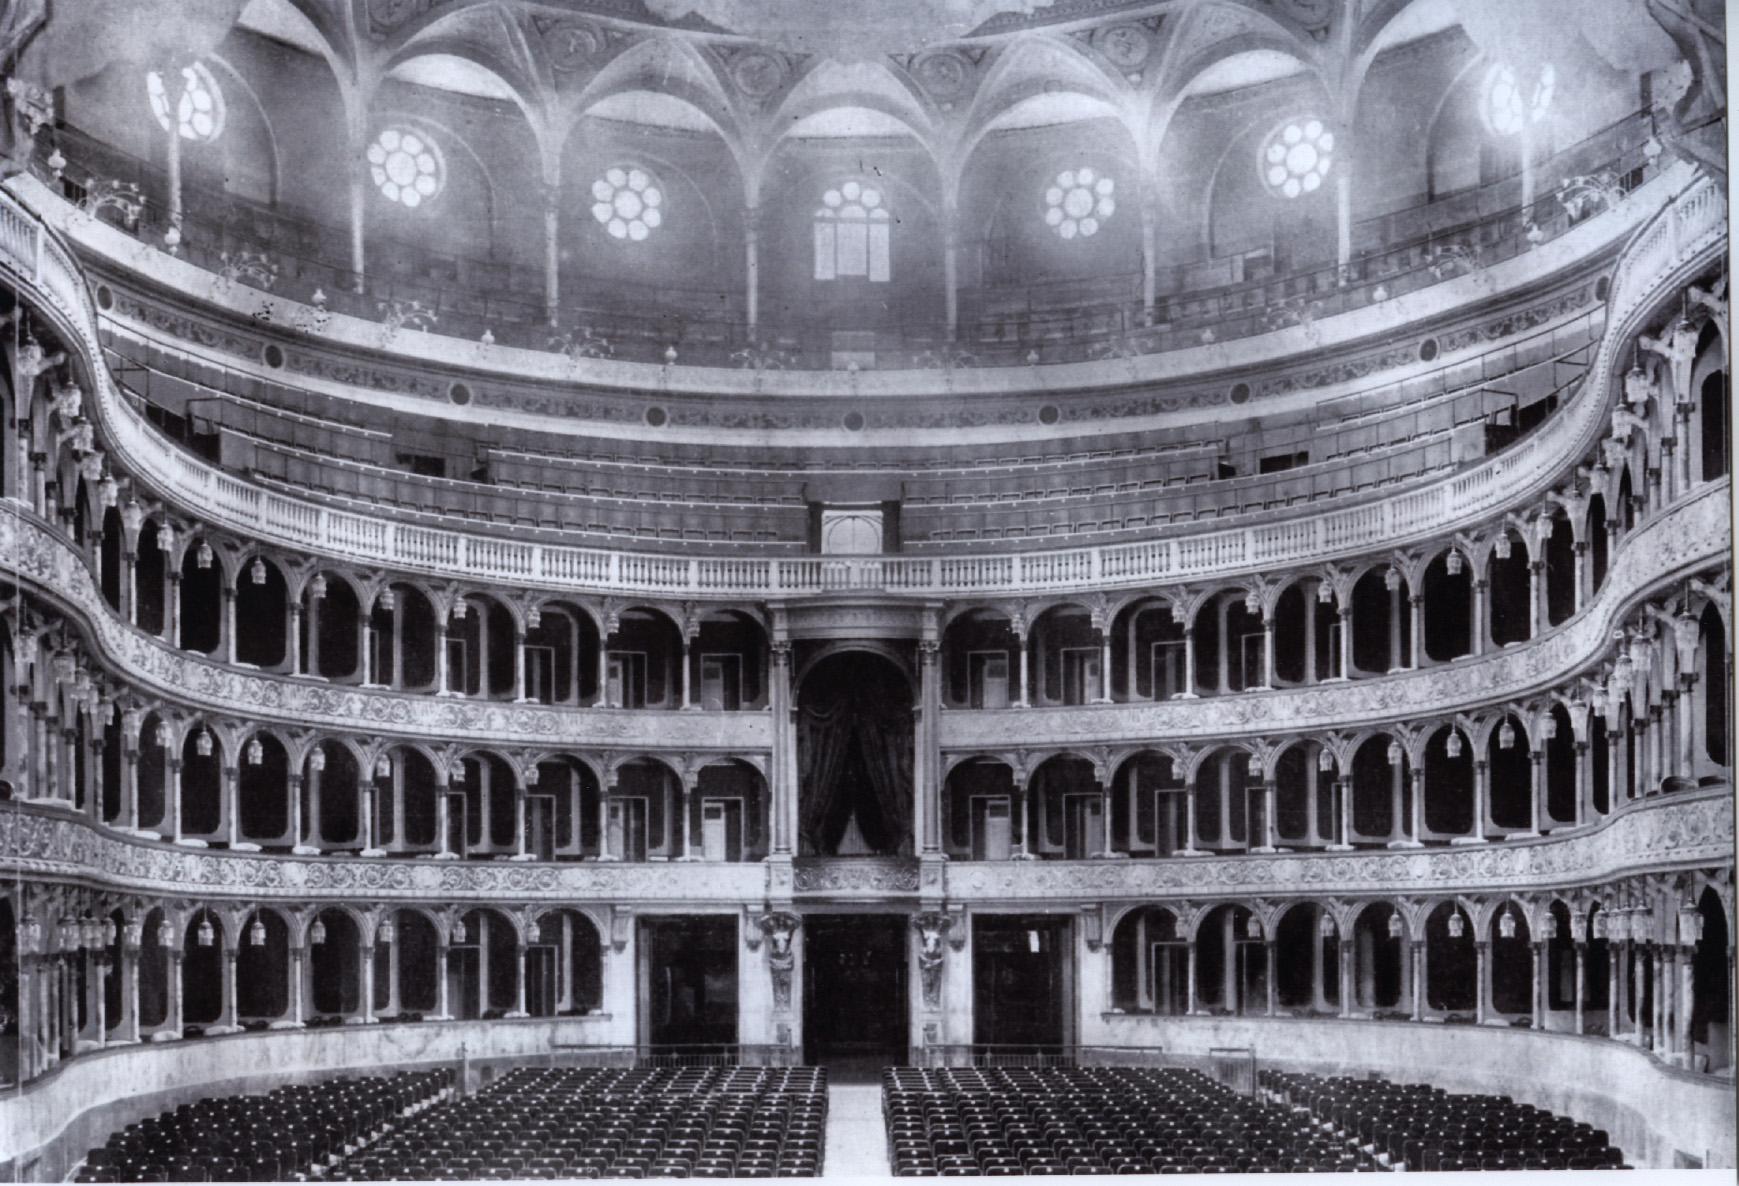 Teatro Costanzi, 1880